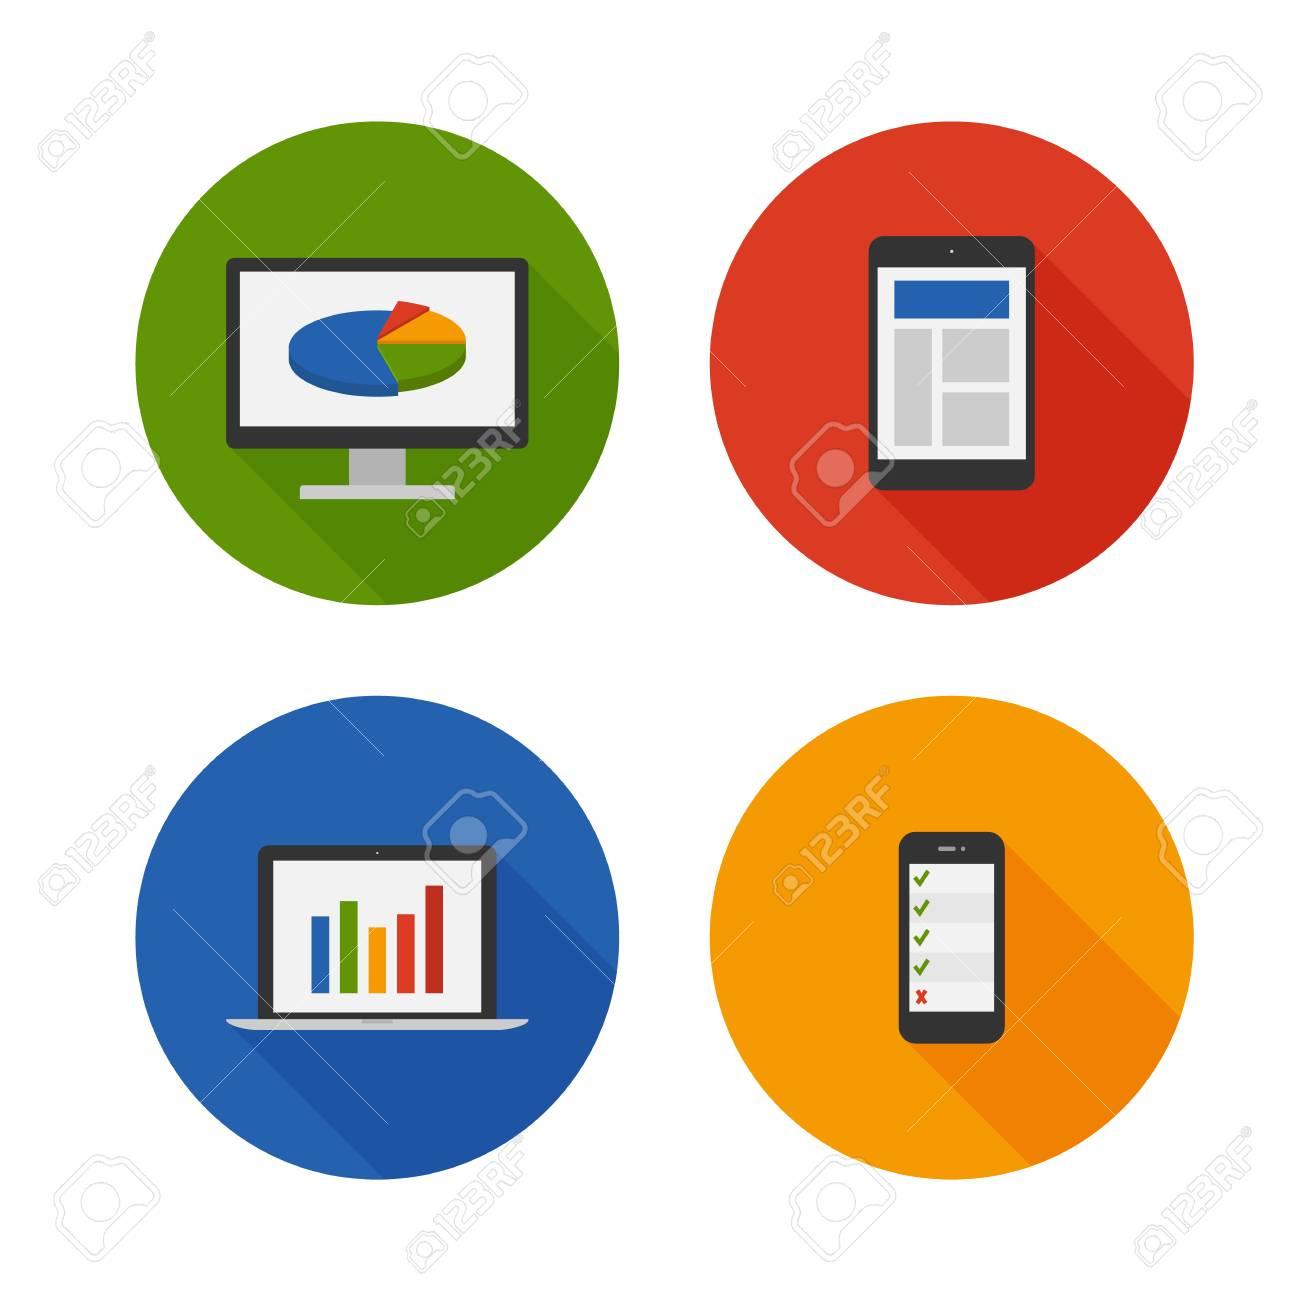 Responsive Design. Flat Icons Set. Vector Stock Vector - 25118930